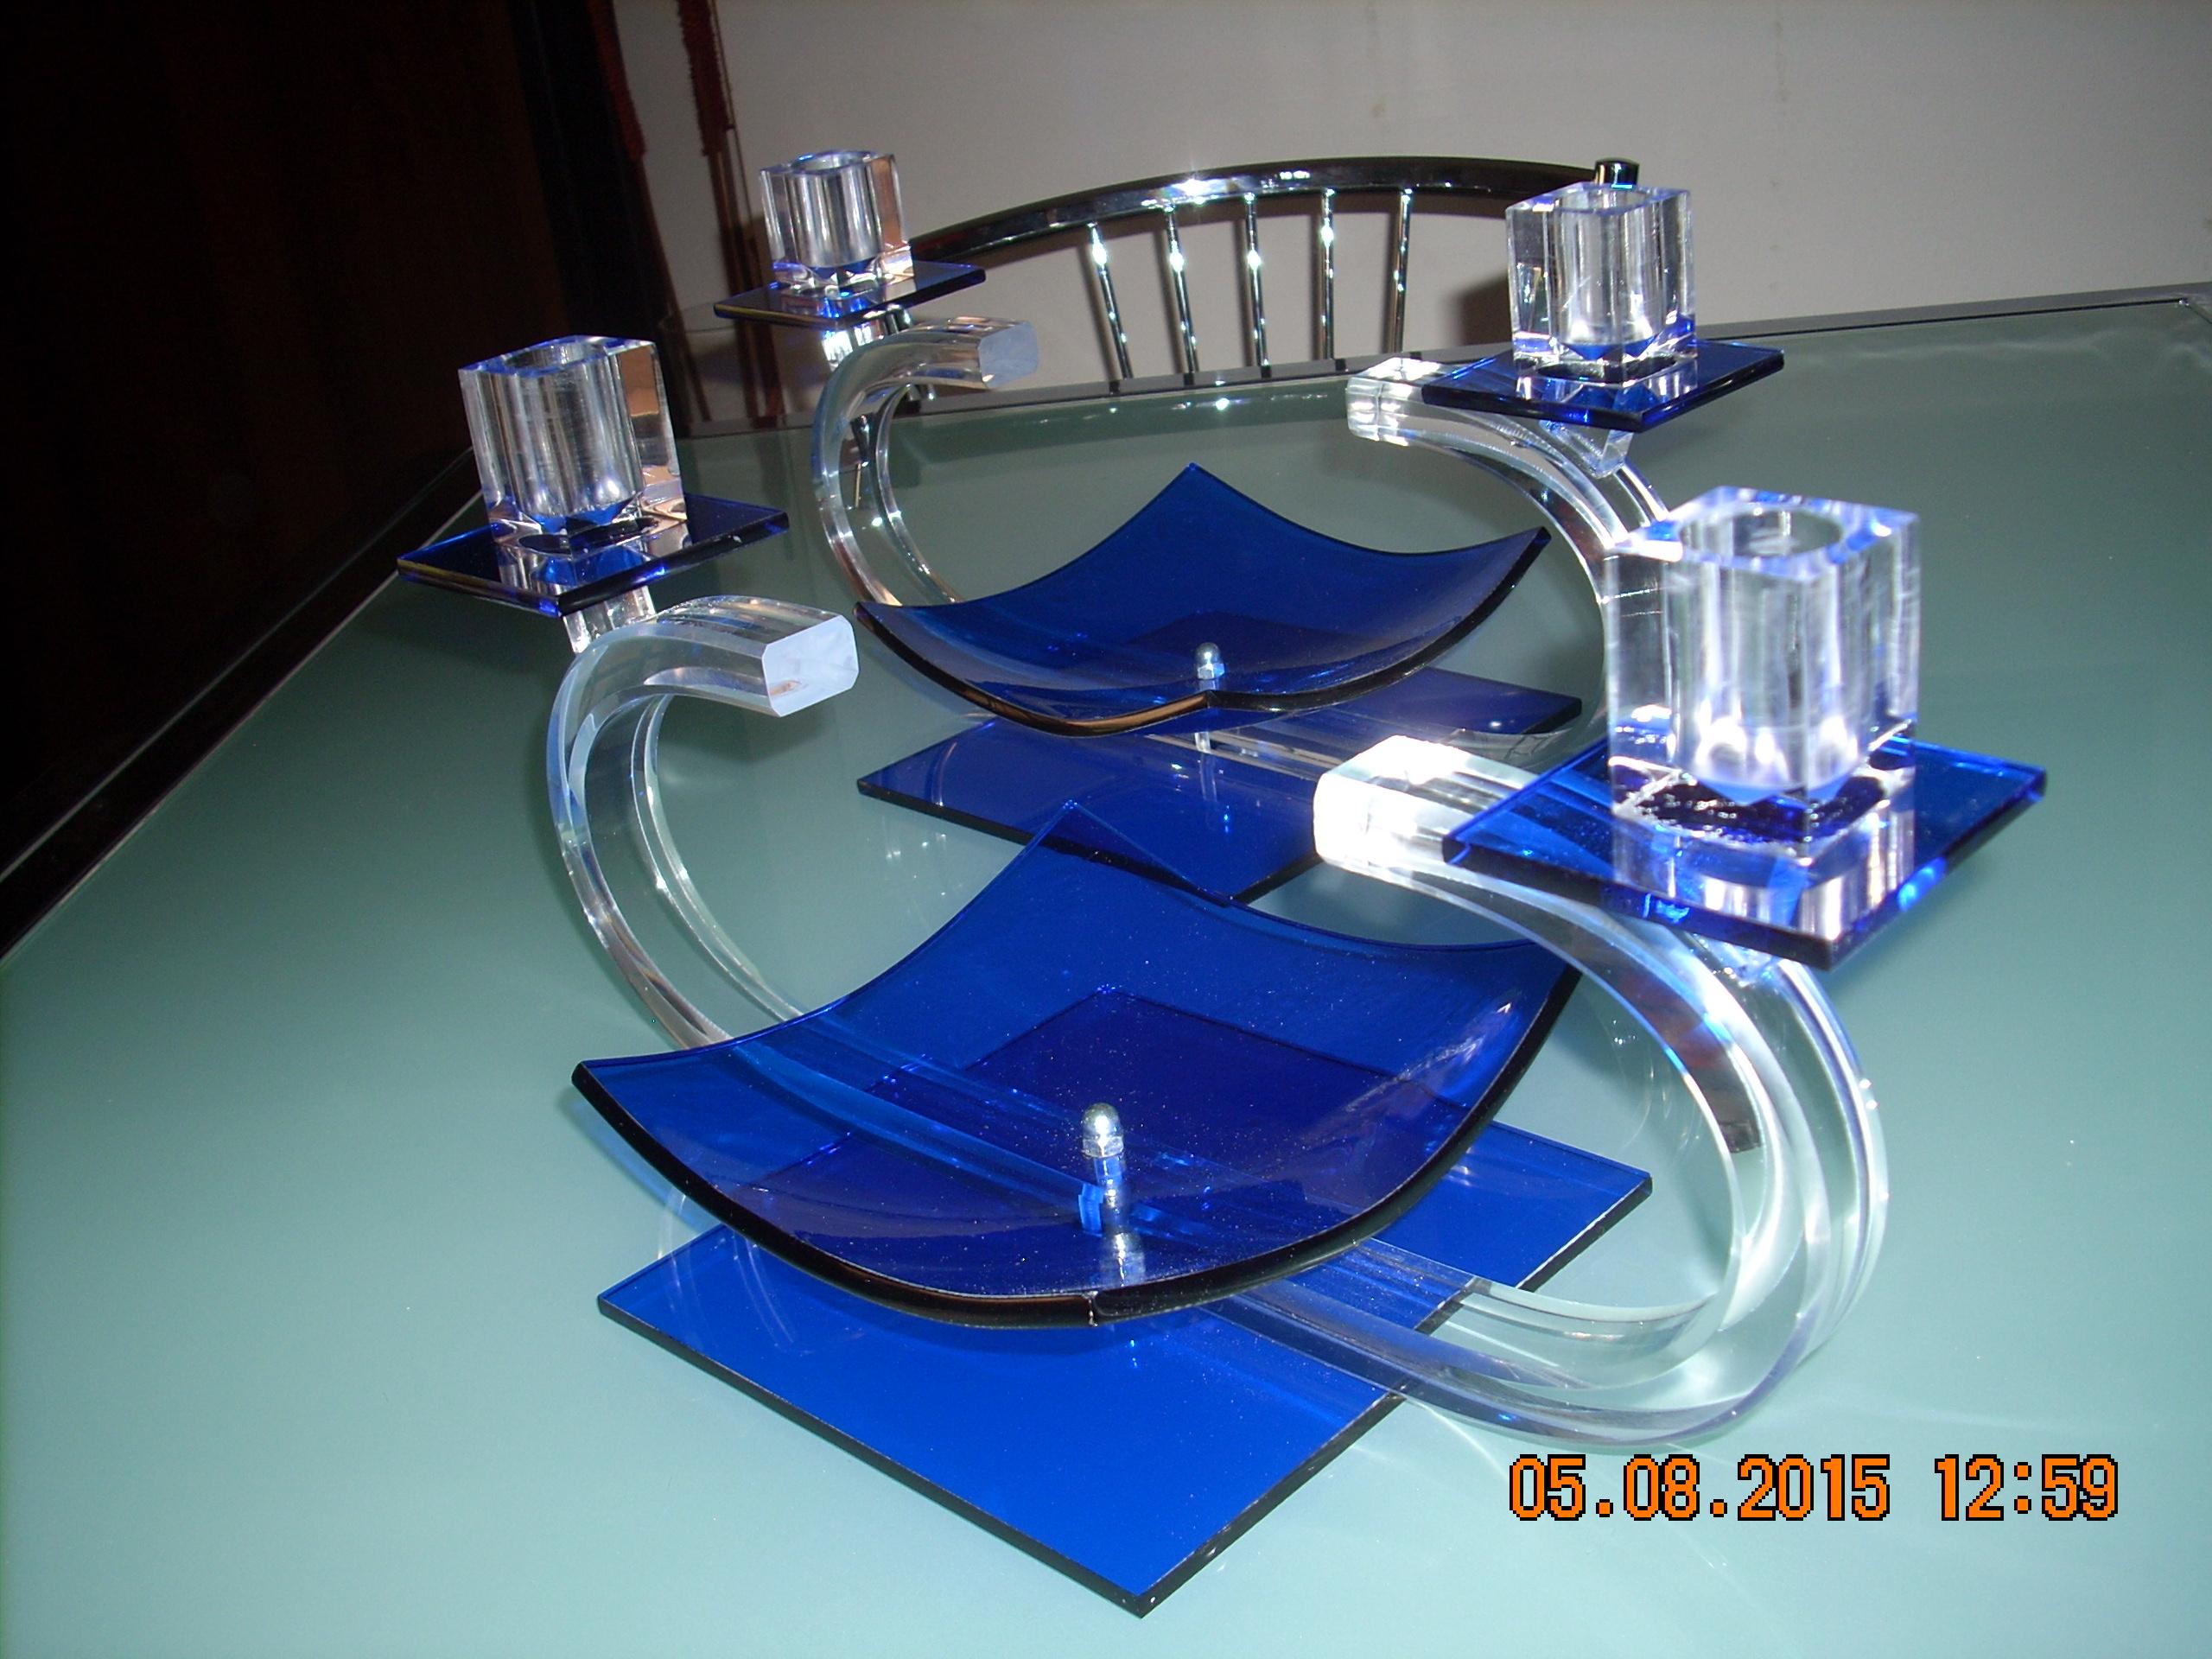 Candelieri in plexiglas